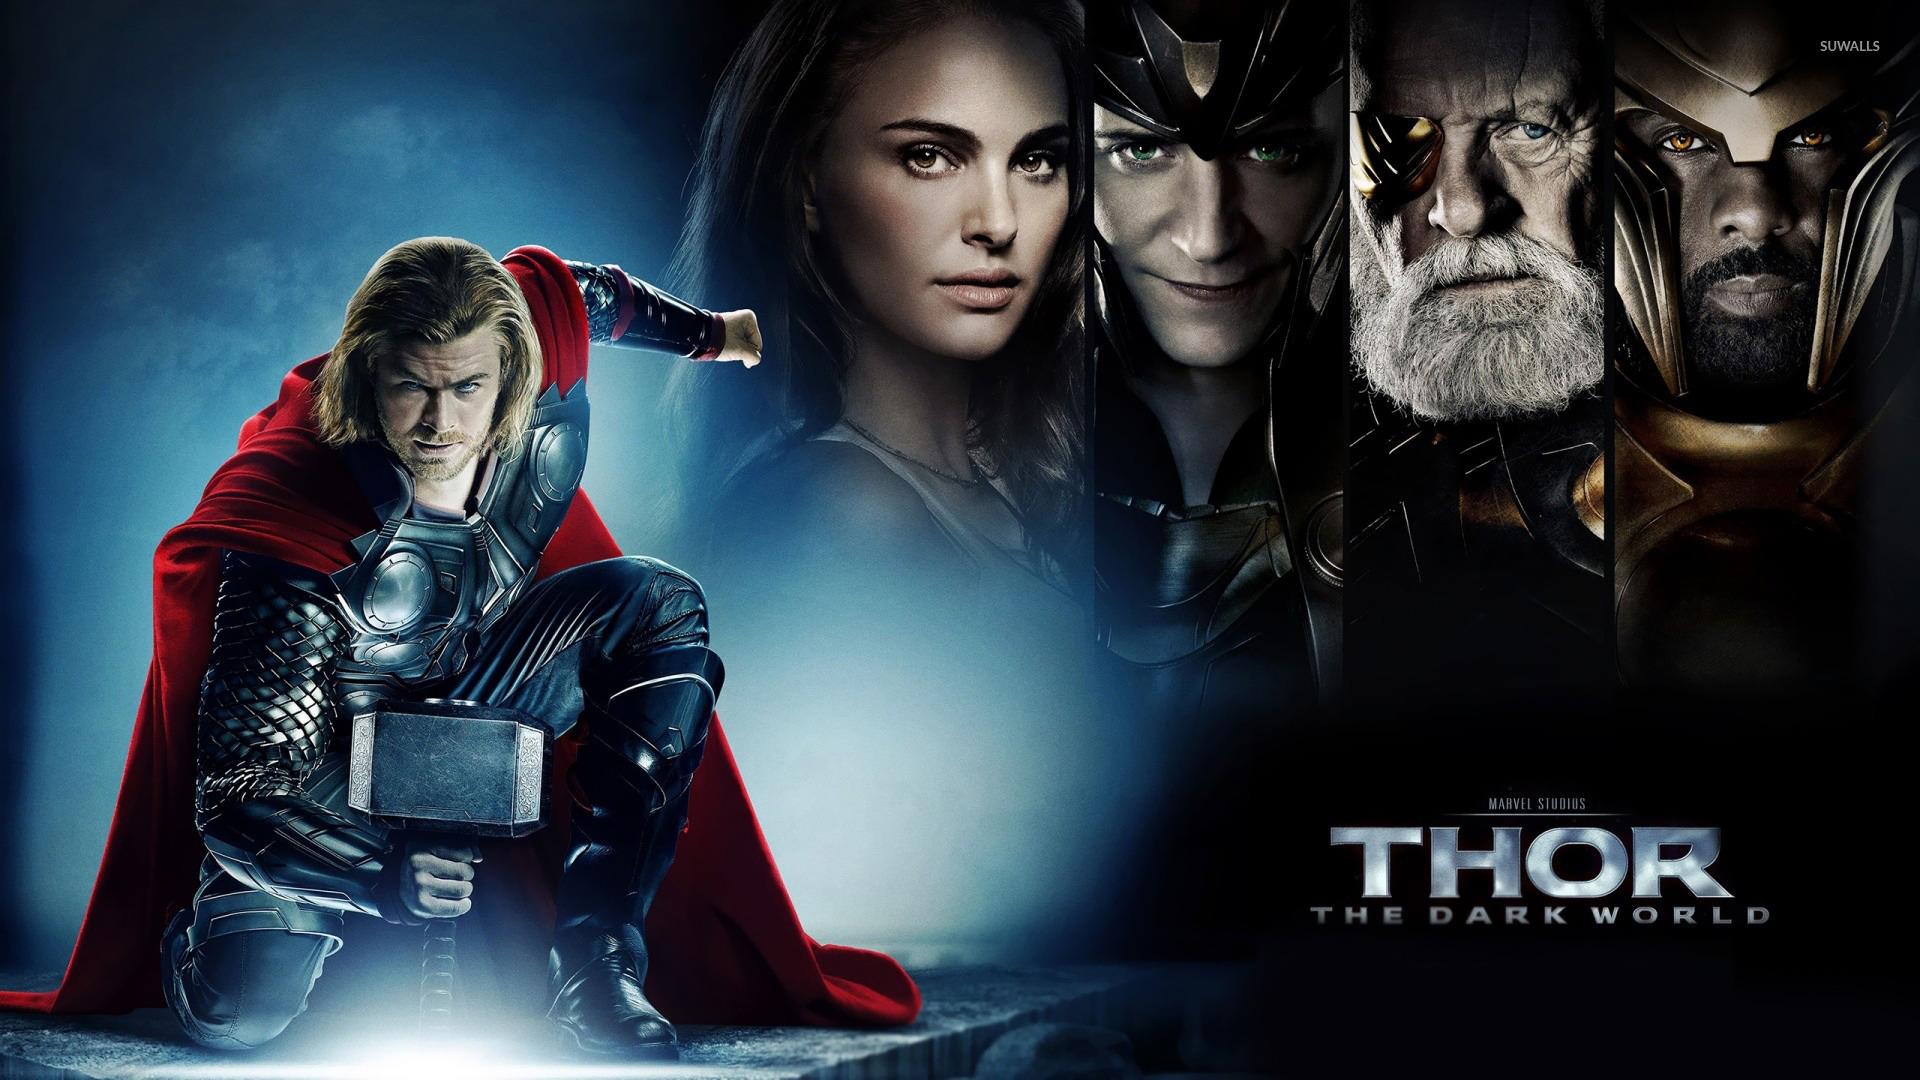 Thor The Dark World 7 Wallpaper Movie Wallpapers 22475